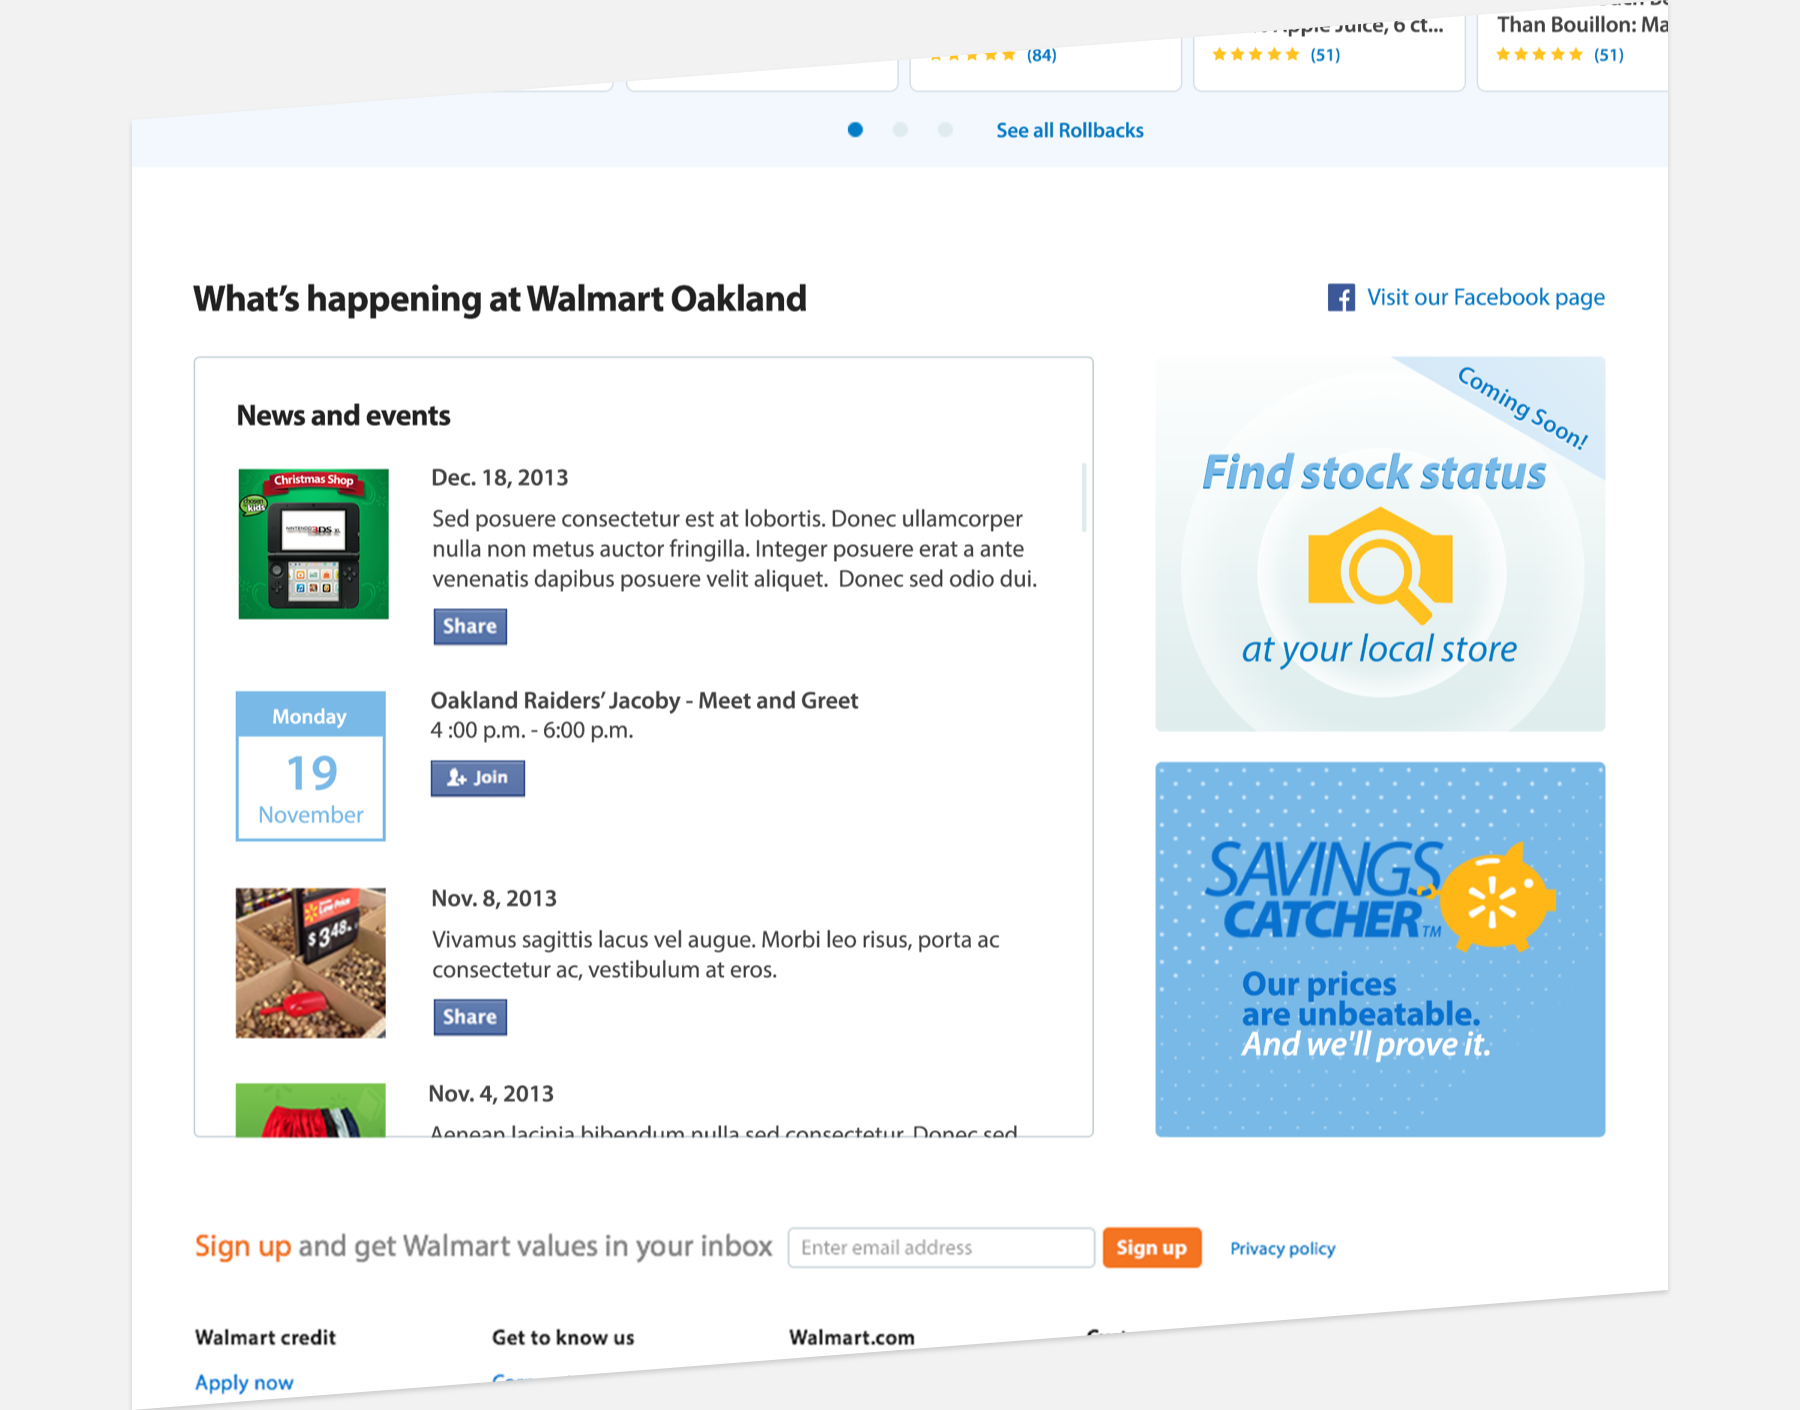 responsive-store-desktop-hours-details-3.png